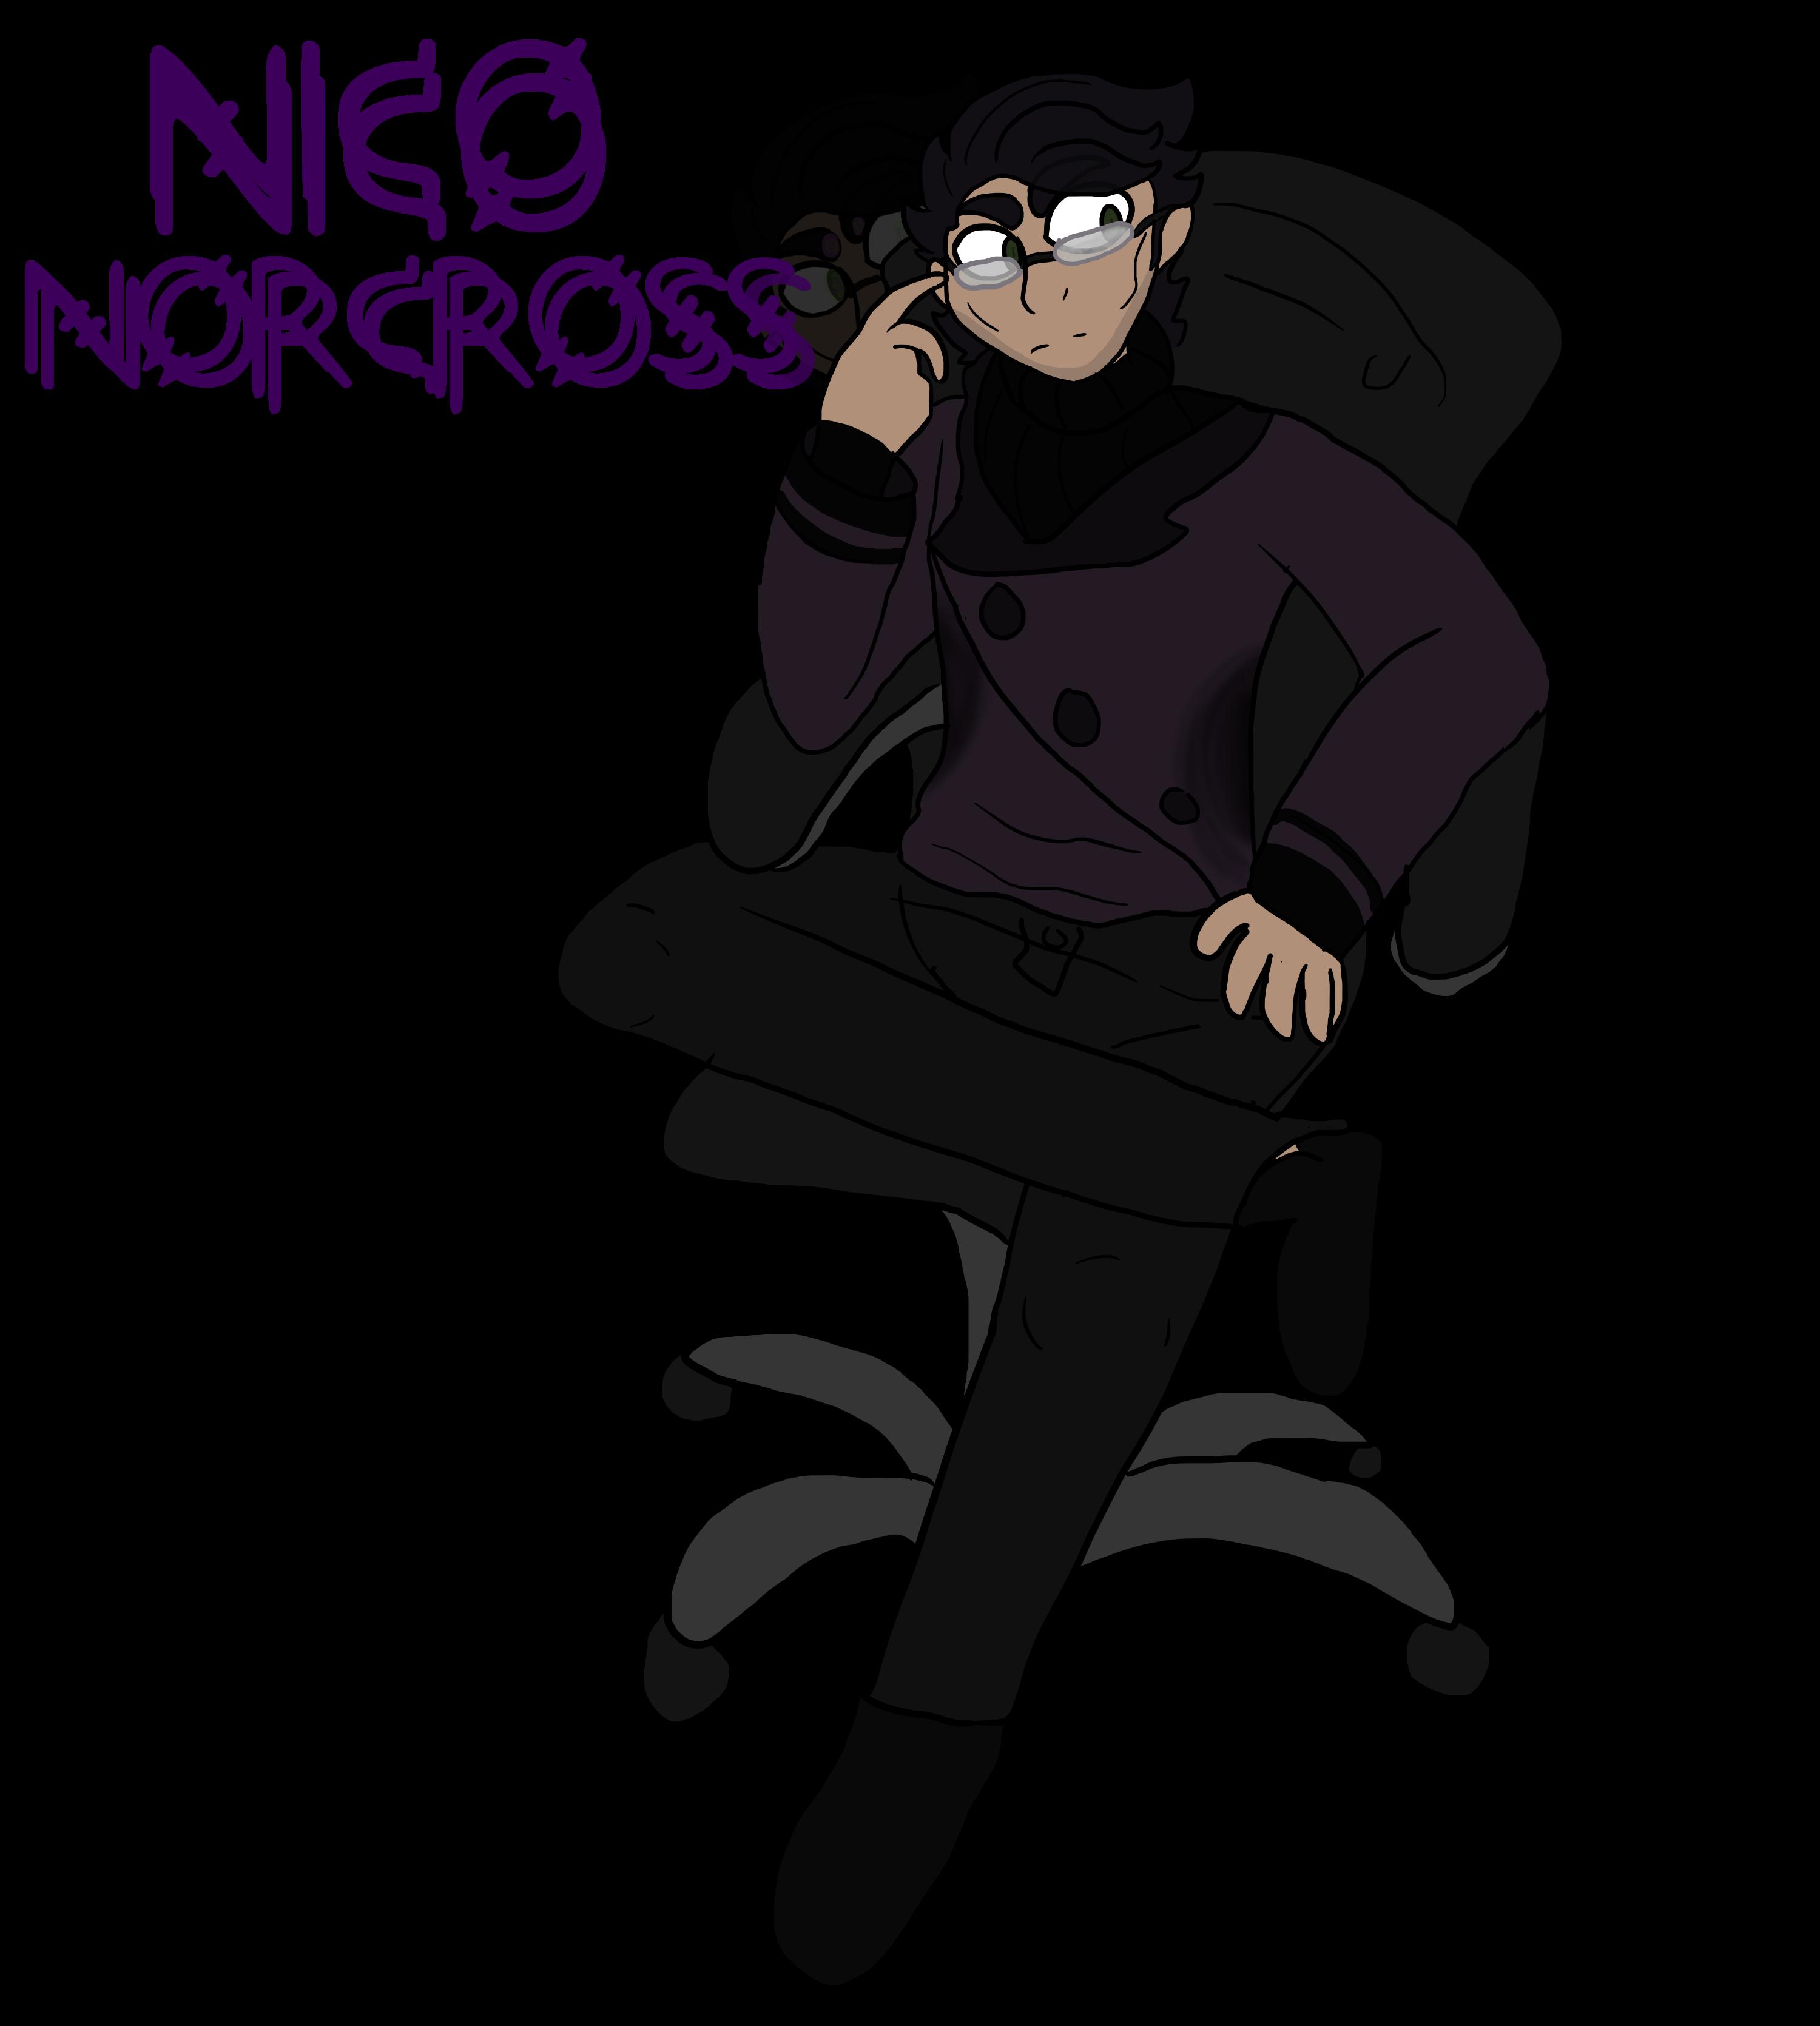 [CV] Nico 'Nox' Norcross by Hiitsuji